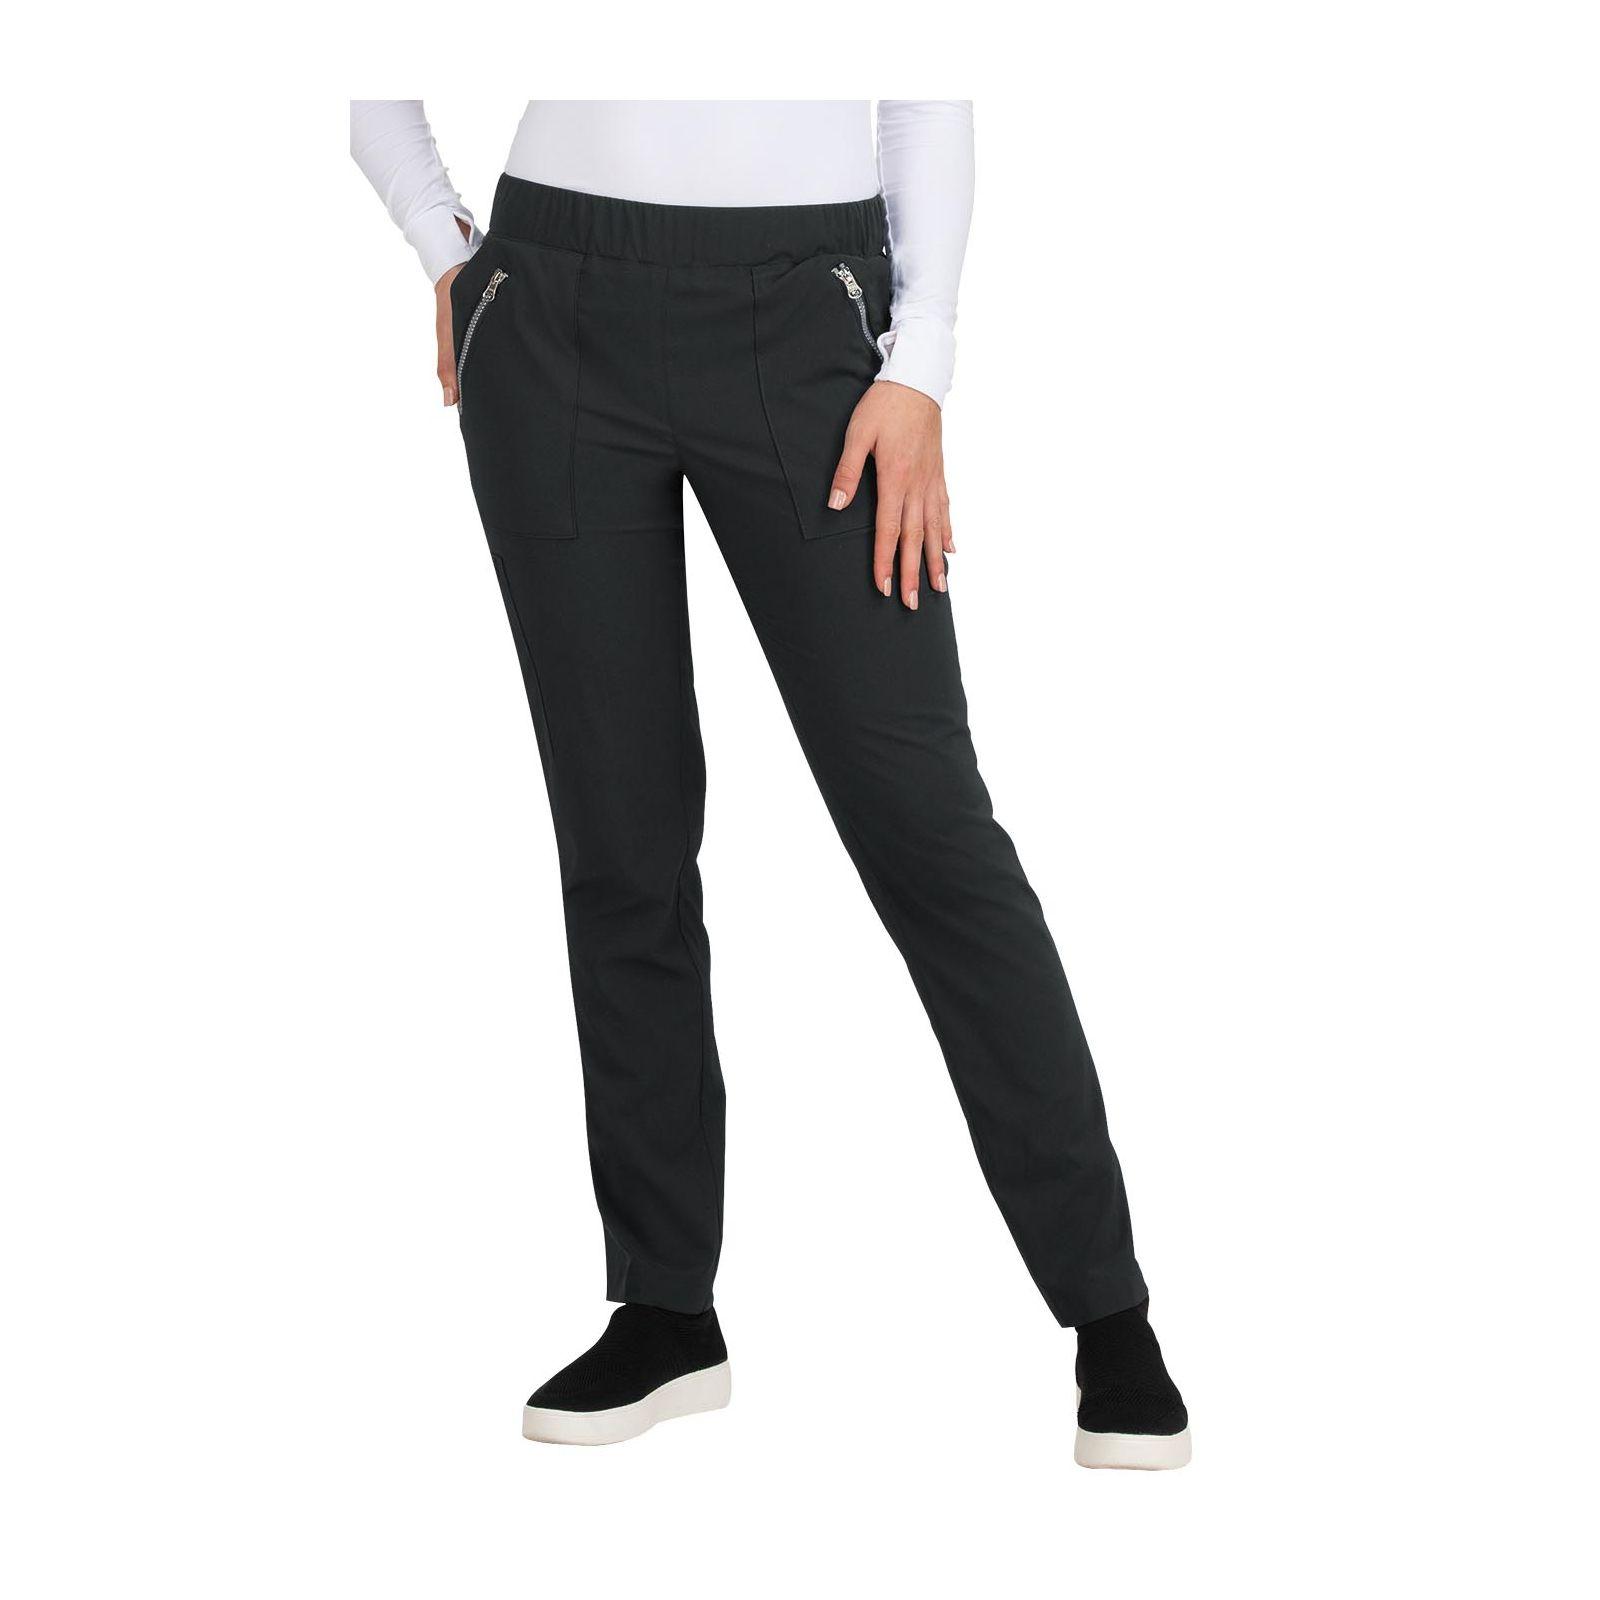 "Pantalon médical Femme Koi ""Jane"", collection ""Koi Basics"" (737-) noir face"